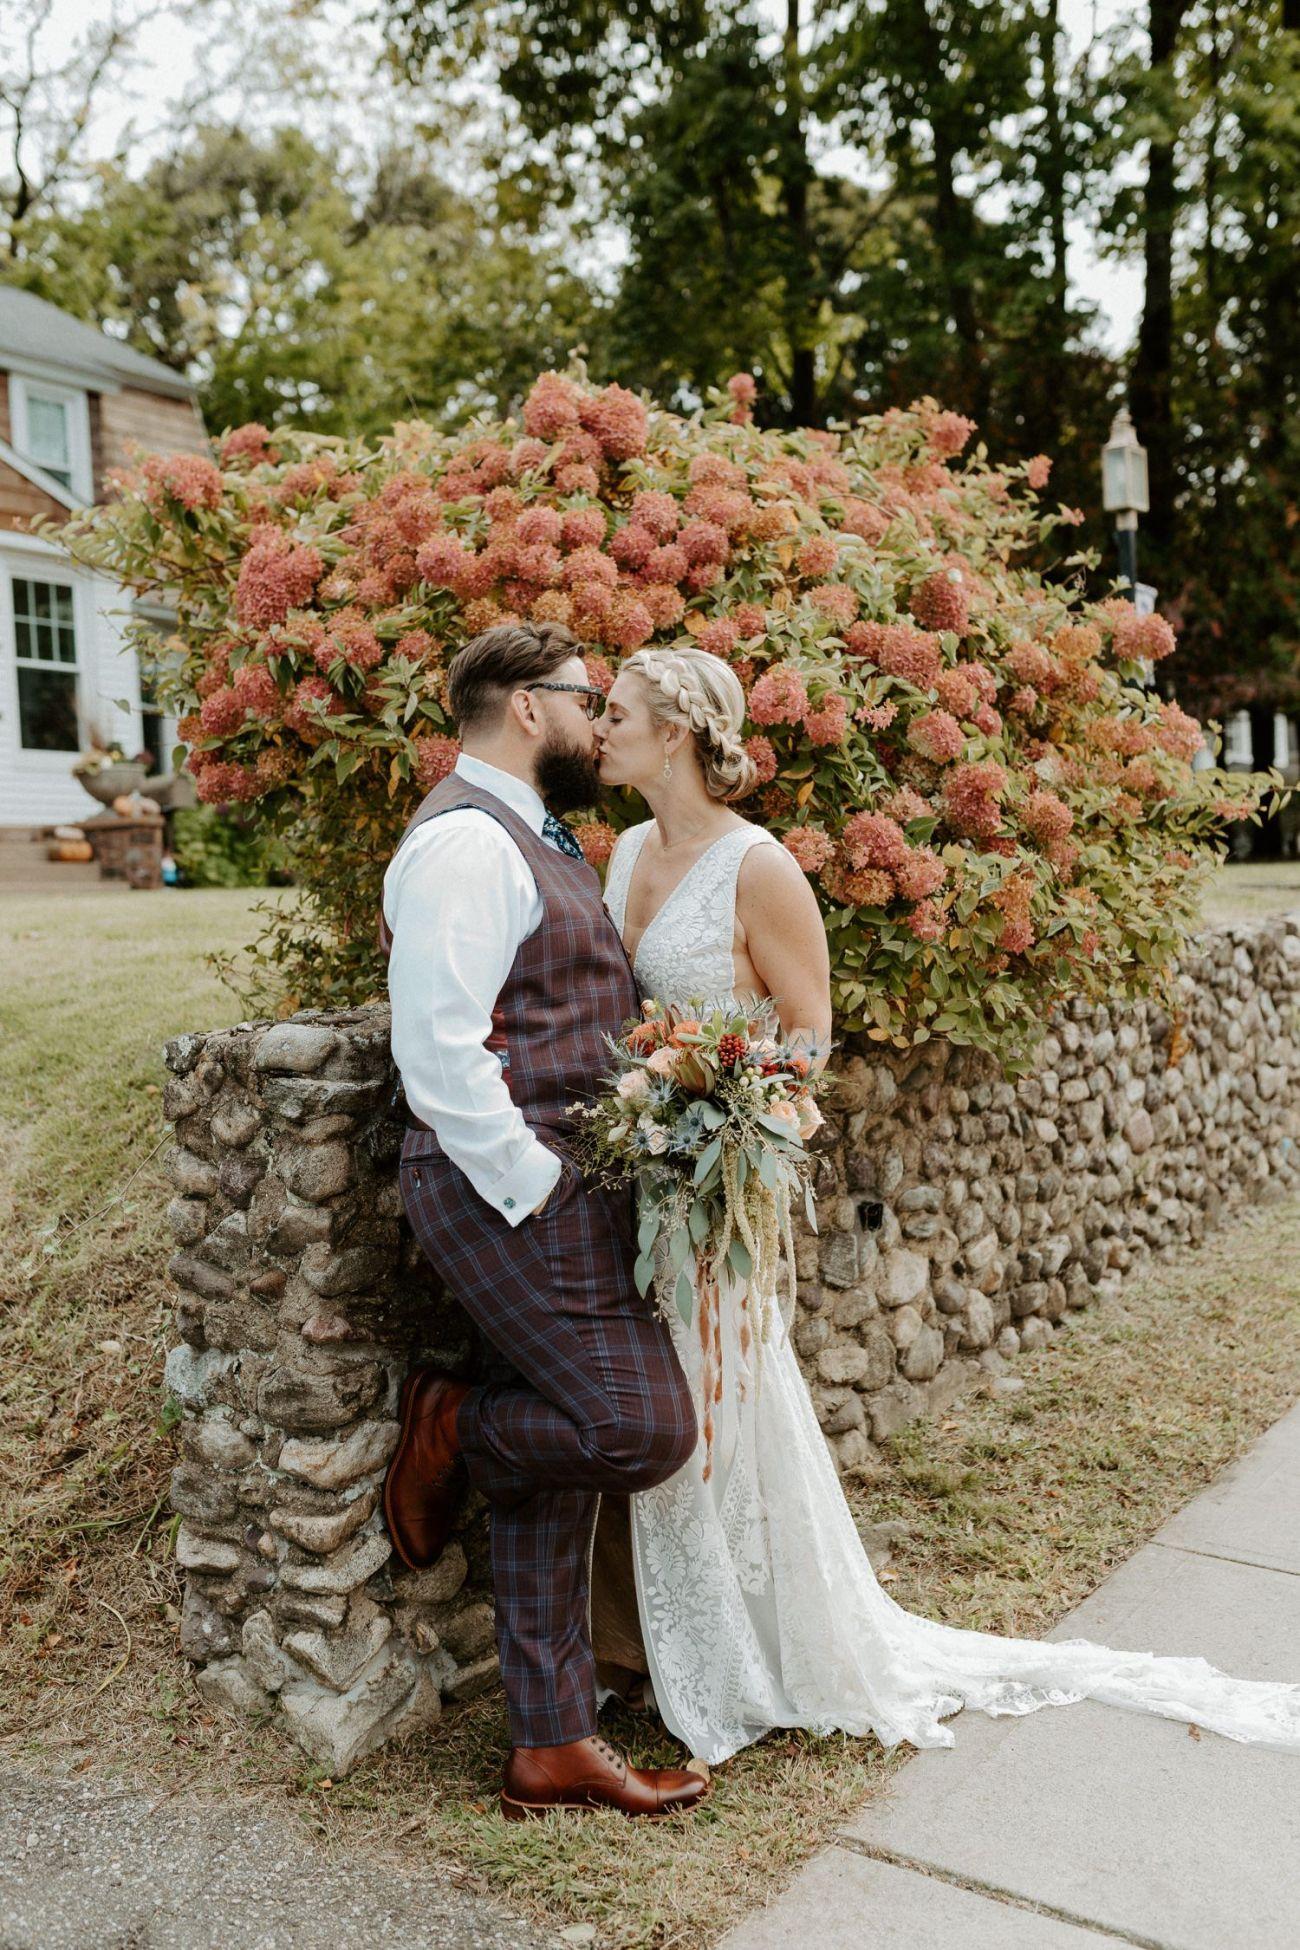 New Jersey Fall Backyard Wedding Bend Wedding Photographer NJ Wedding Photographer Anais Possamai Photography 022